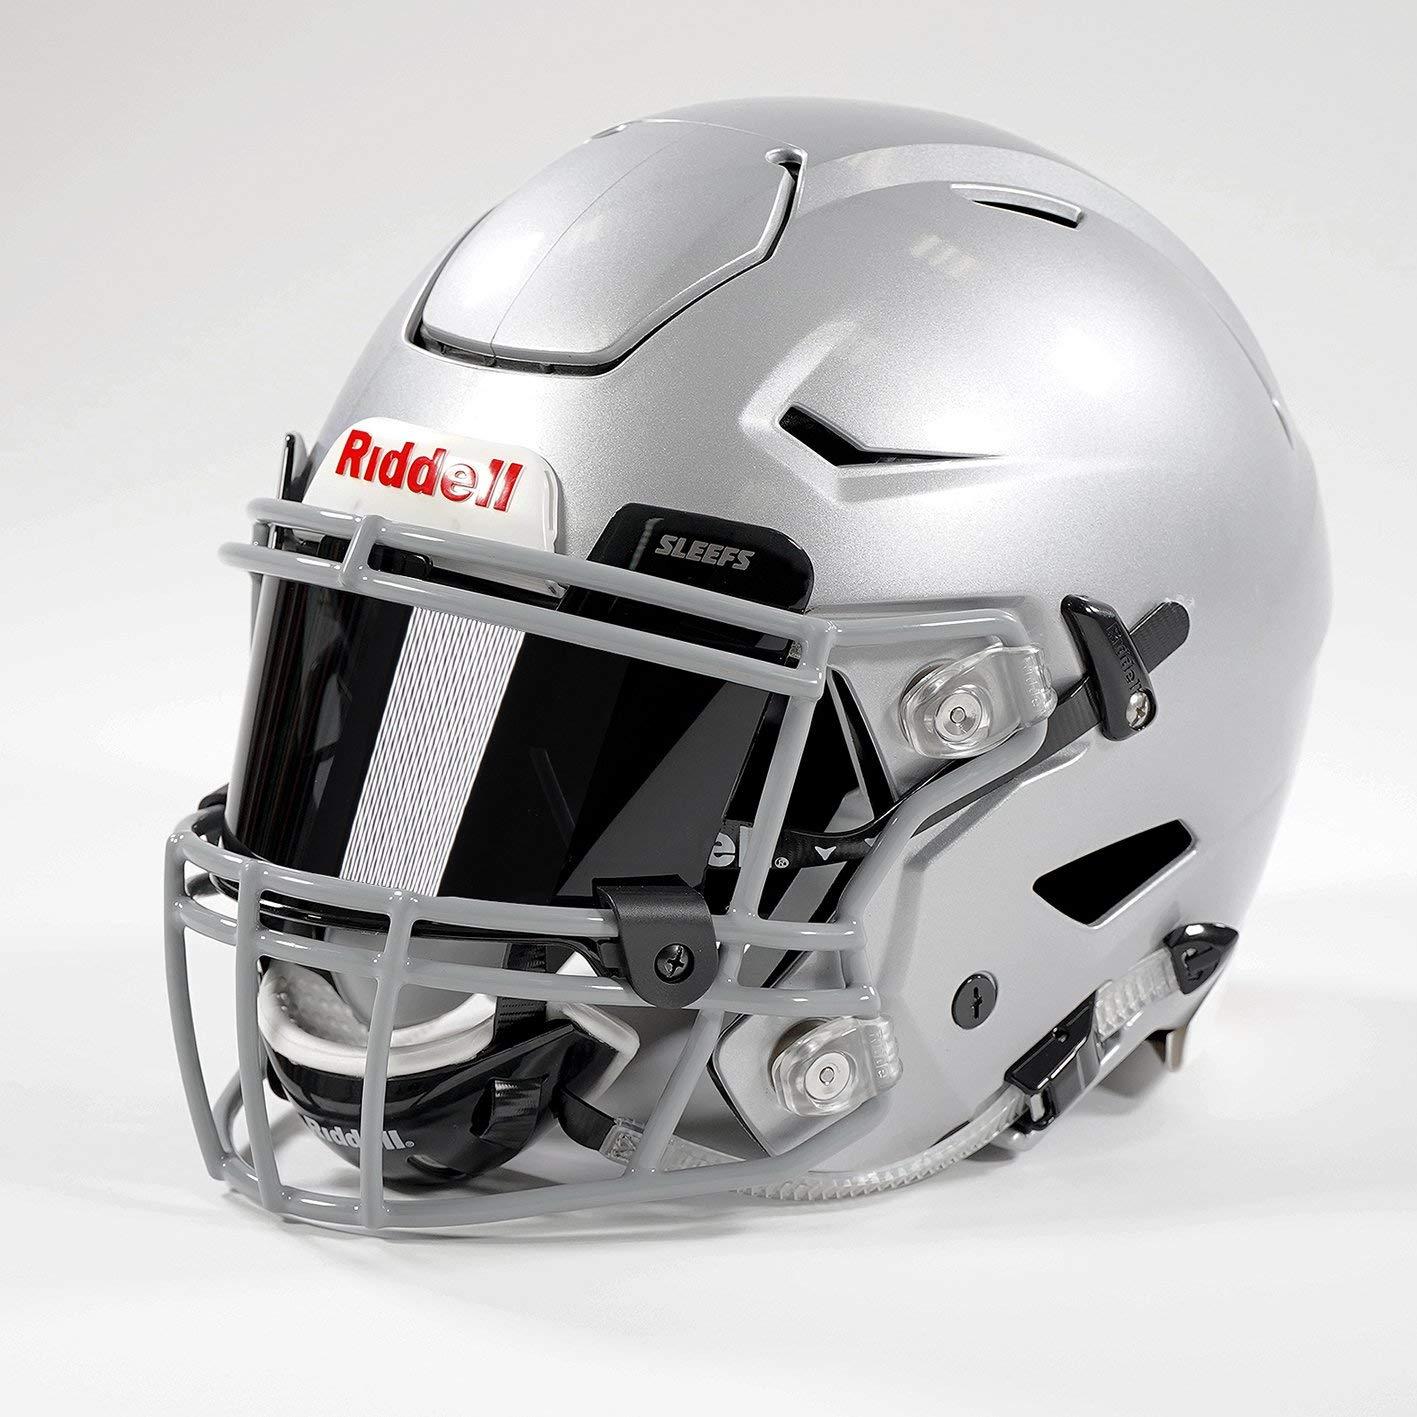 SLEEFS Black Diamond X Helmet Eye-Shield Color Tinted Visor